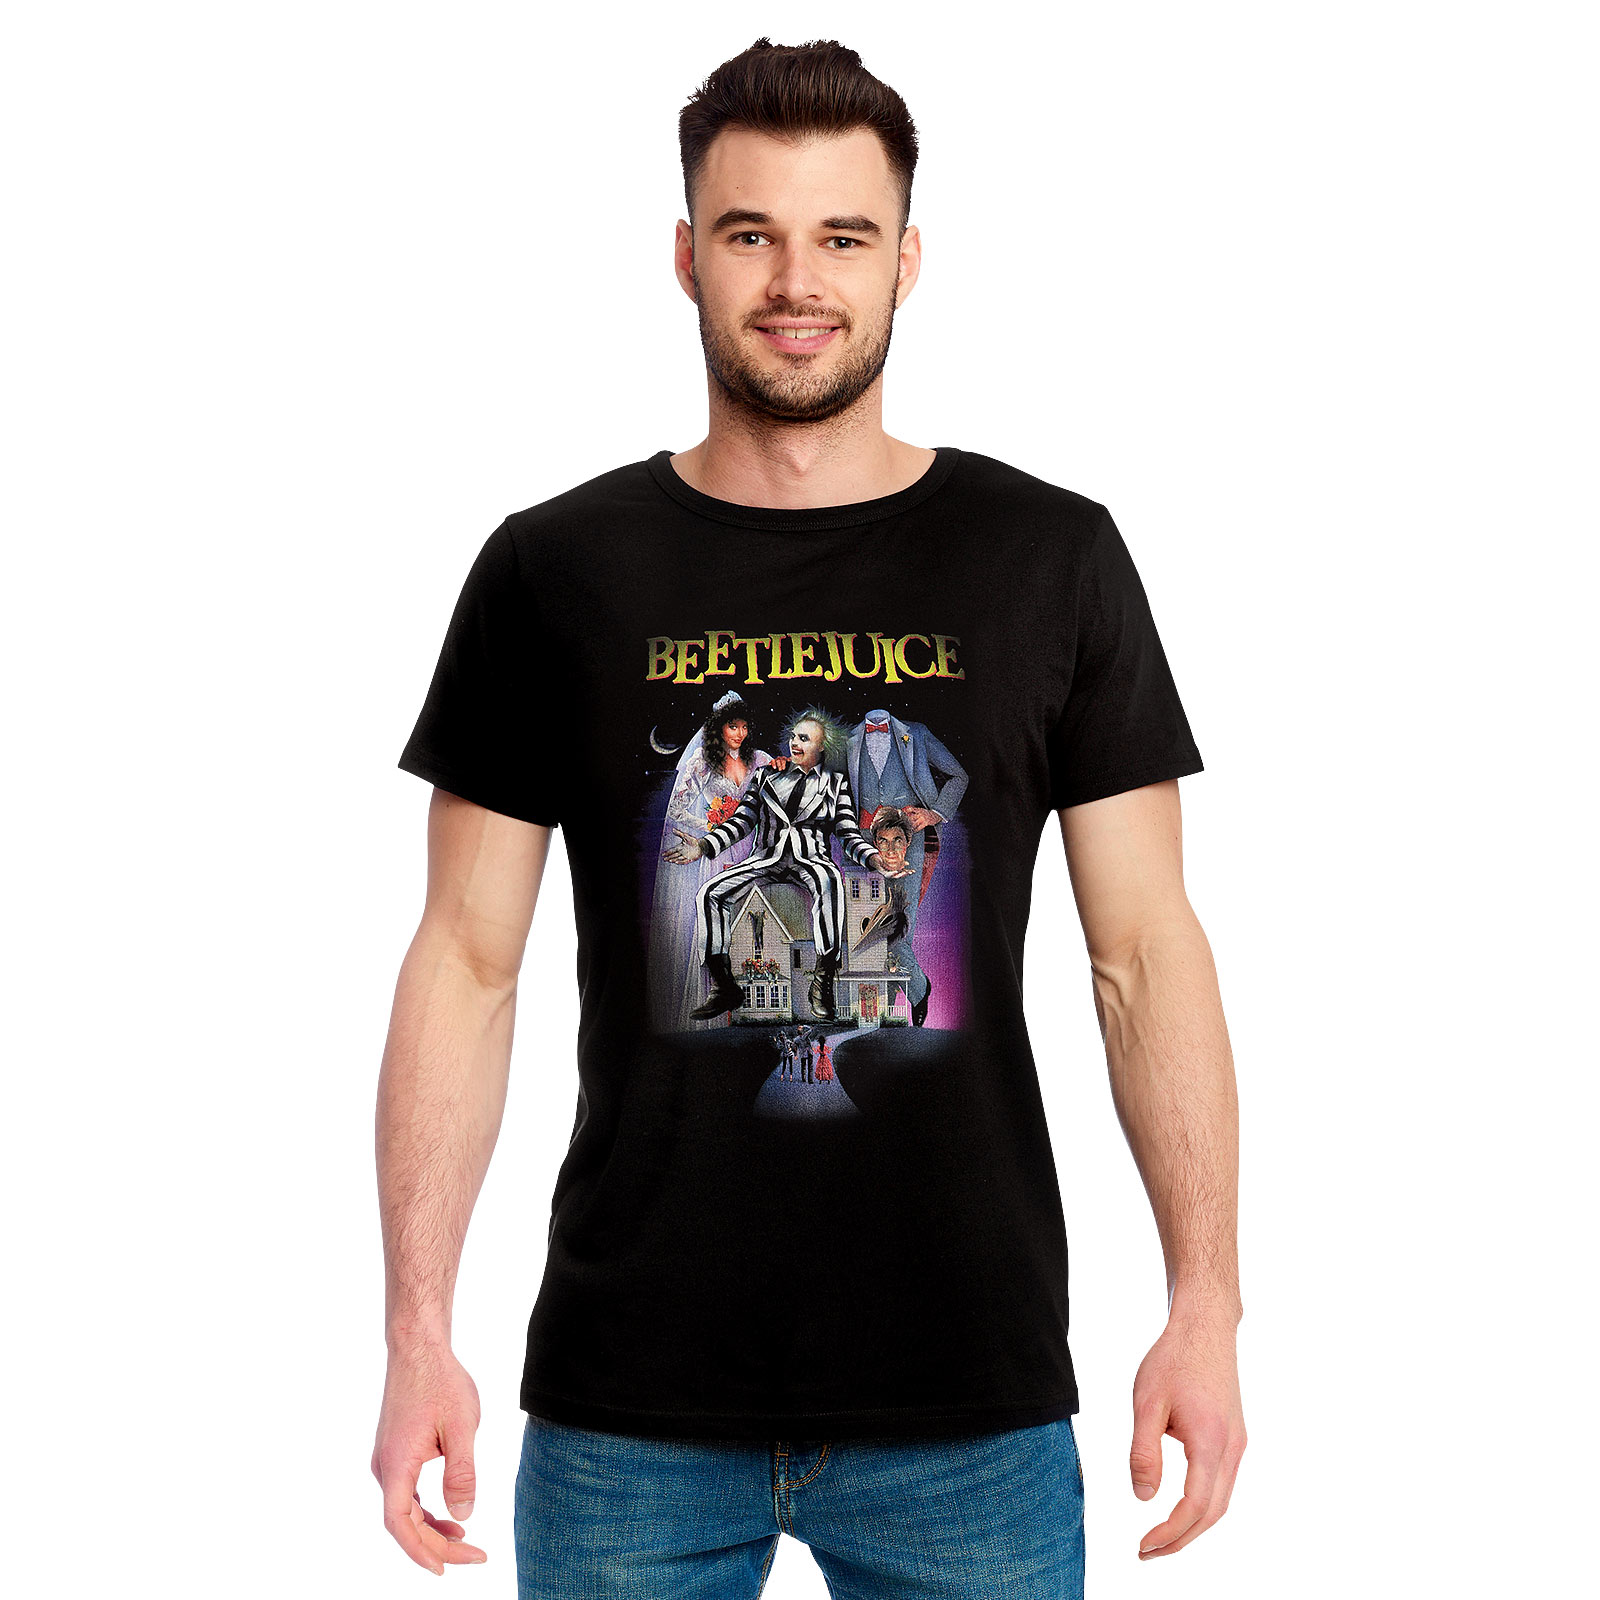 Beetlejuice - Movie Poster T-Shirt schwarz